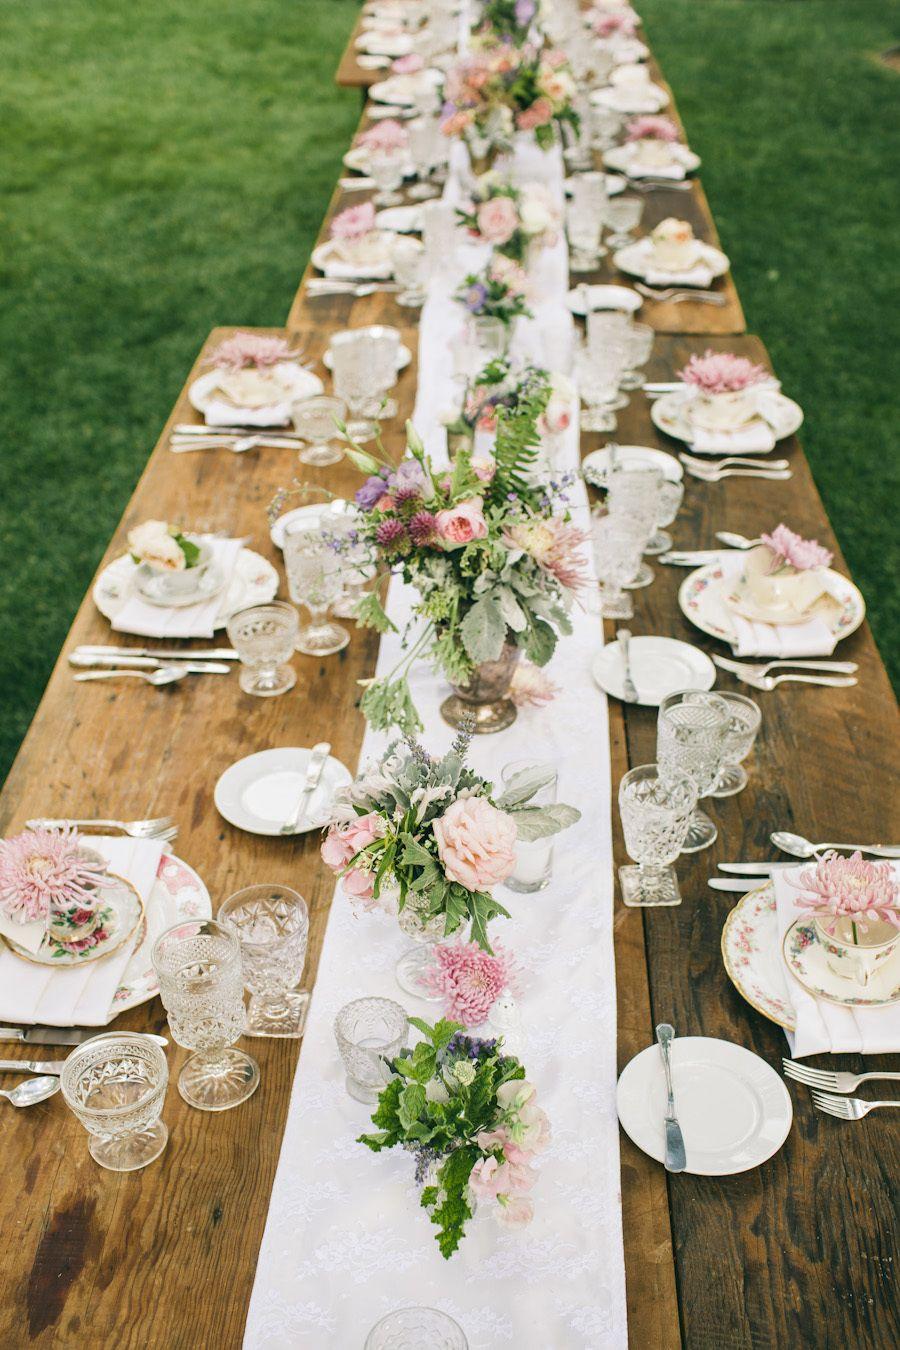 Photography Linda Arredondo Wedding Venue Whispering Pines Estate Florist Art With